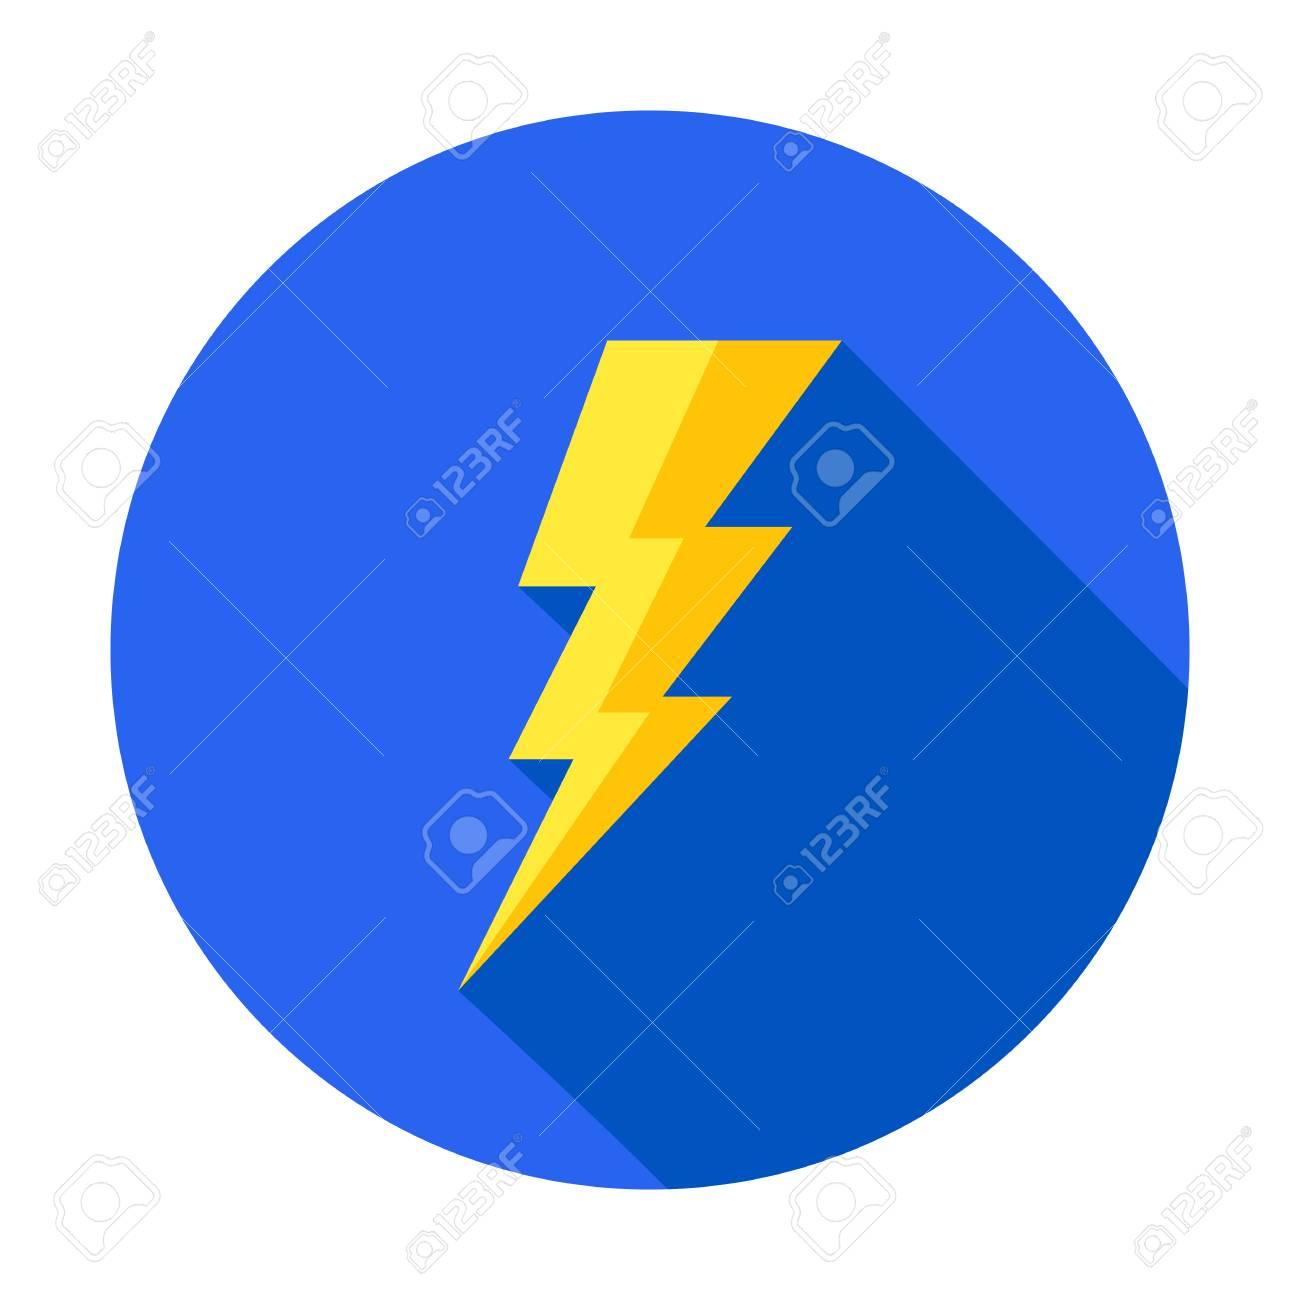 Flash icon. Bolt of lightning vector. Lightning illustration. Streak of lightning sign. Electric bolt flash icon. Lightning design element. Thunder strike logo. Charge flash icon. Thunderbolt icon - 112464009